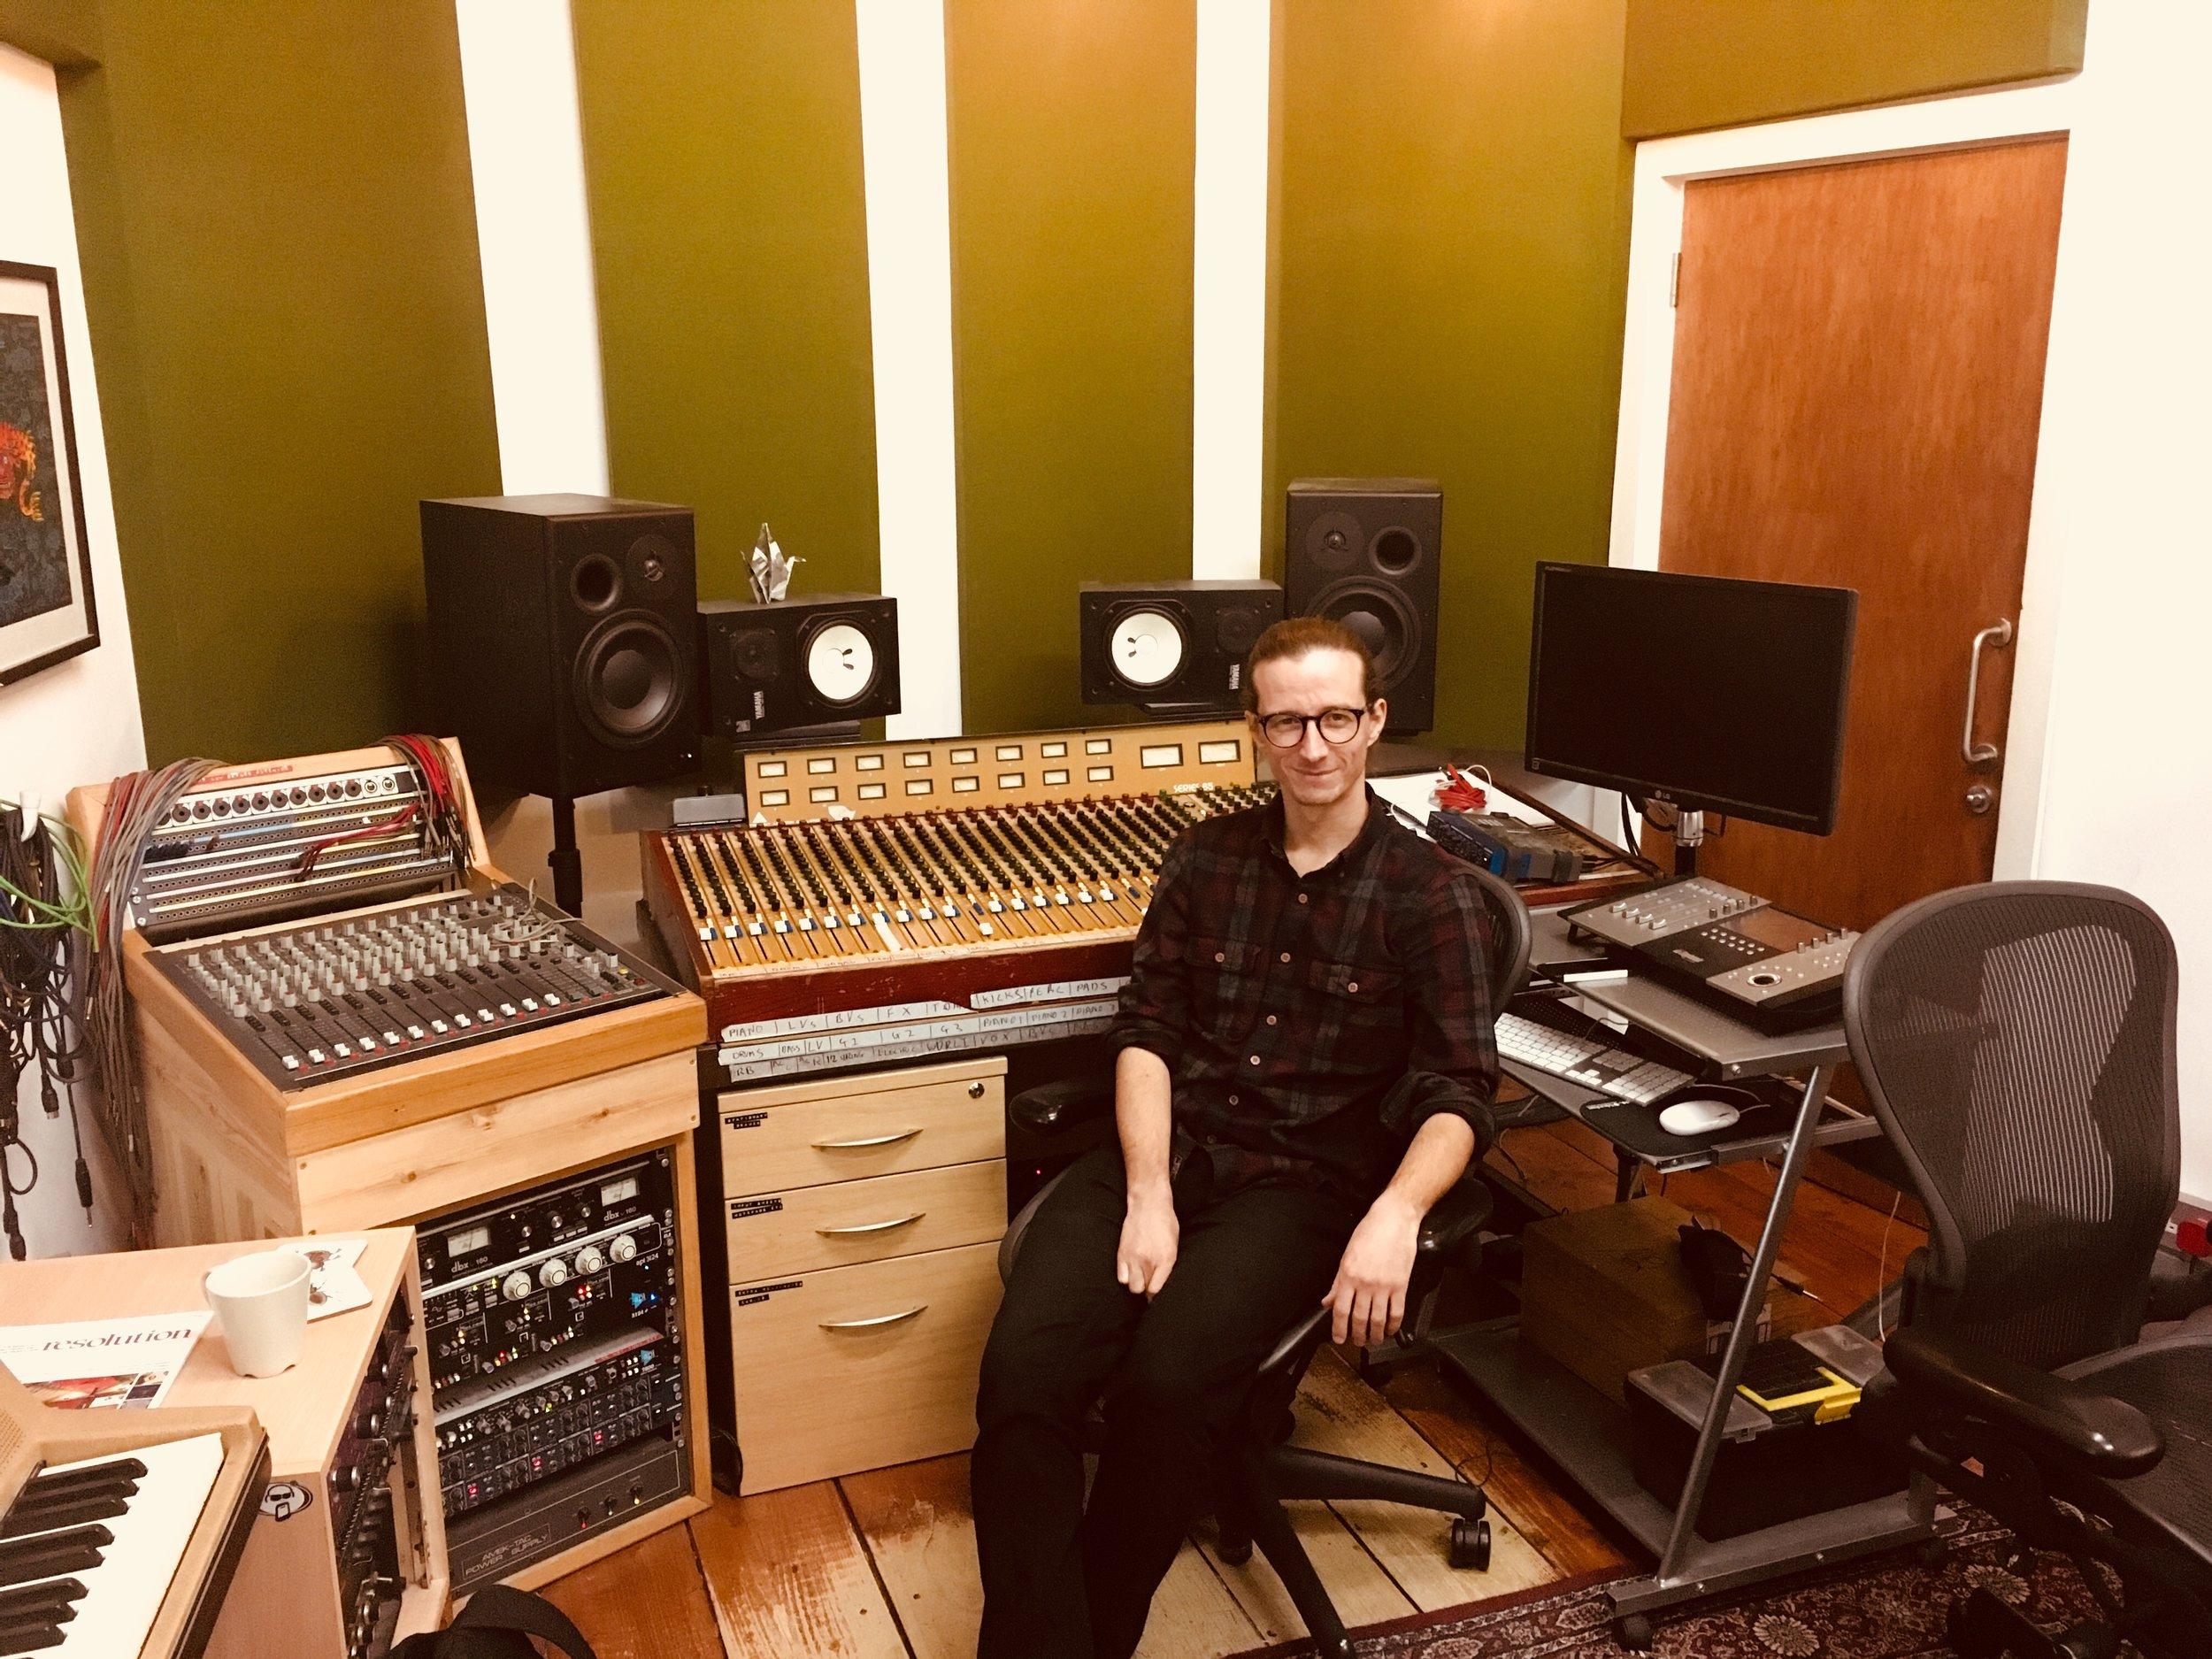 Dan at Urchin Studios